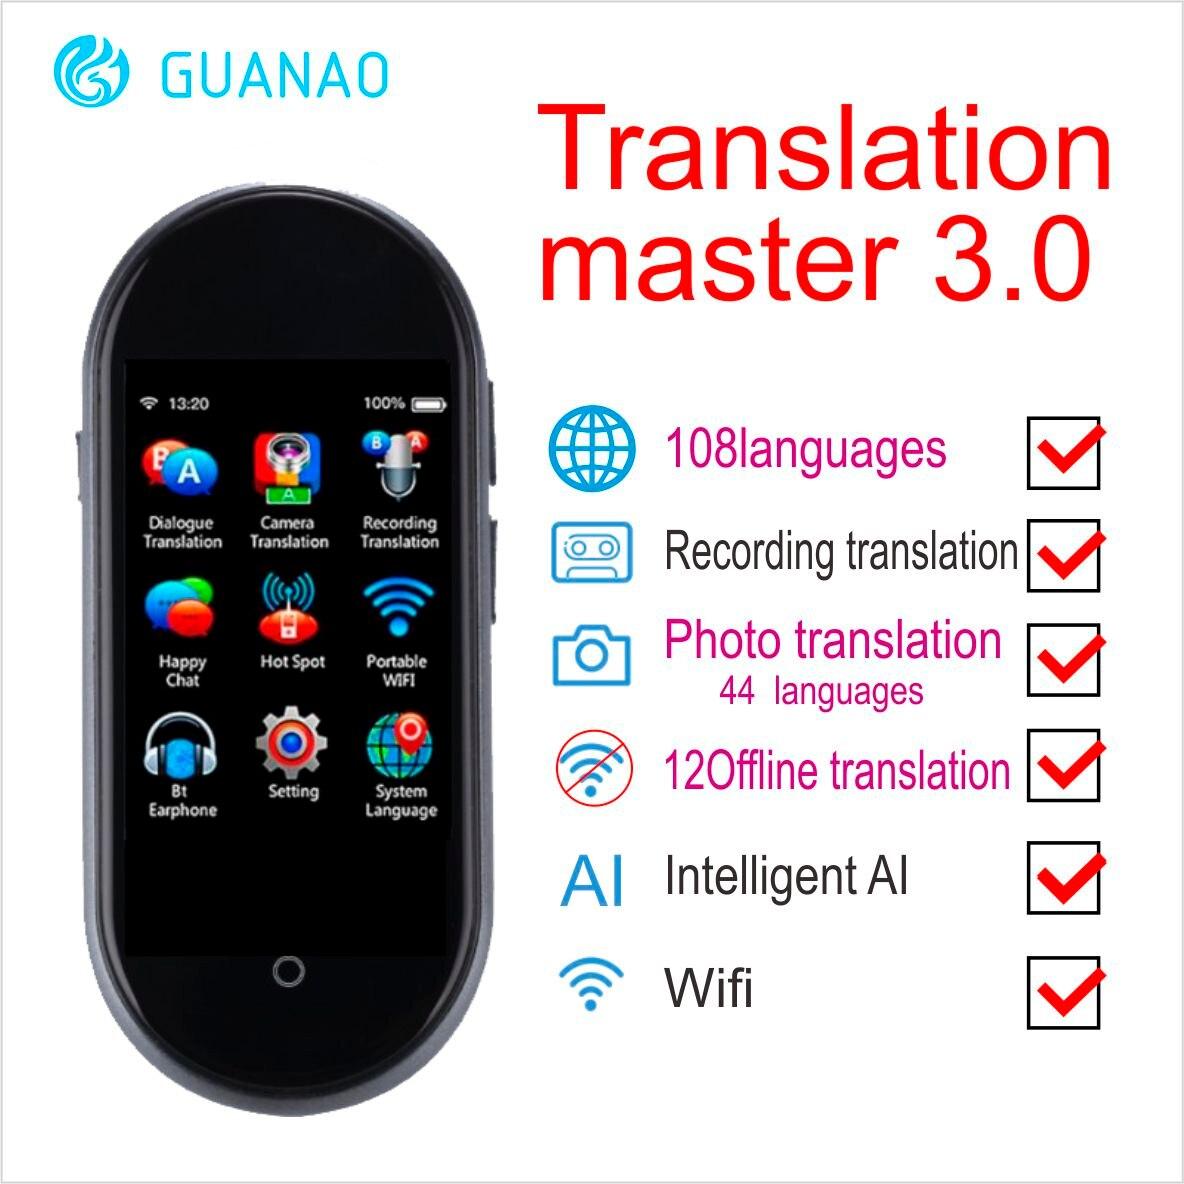 Tradutor de Voz Global Portátil Inteligente Idioma Dupla Philips Alto-falantes Foto Traduzir Instantâneo Voic Tradutor 108